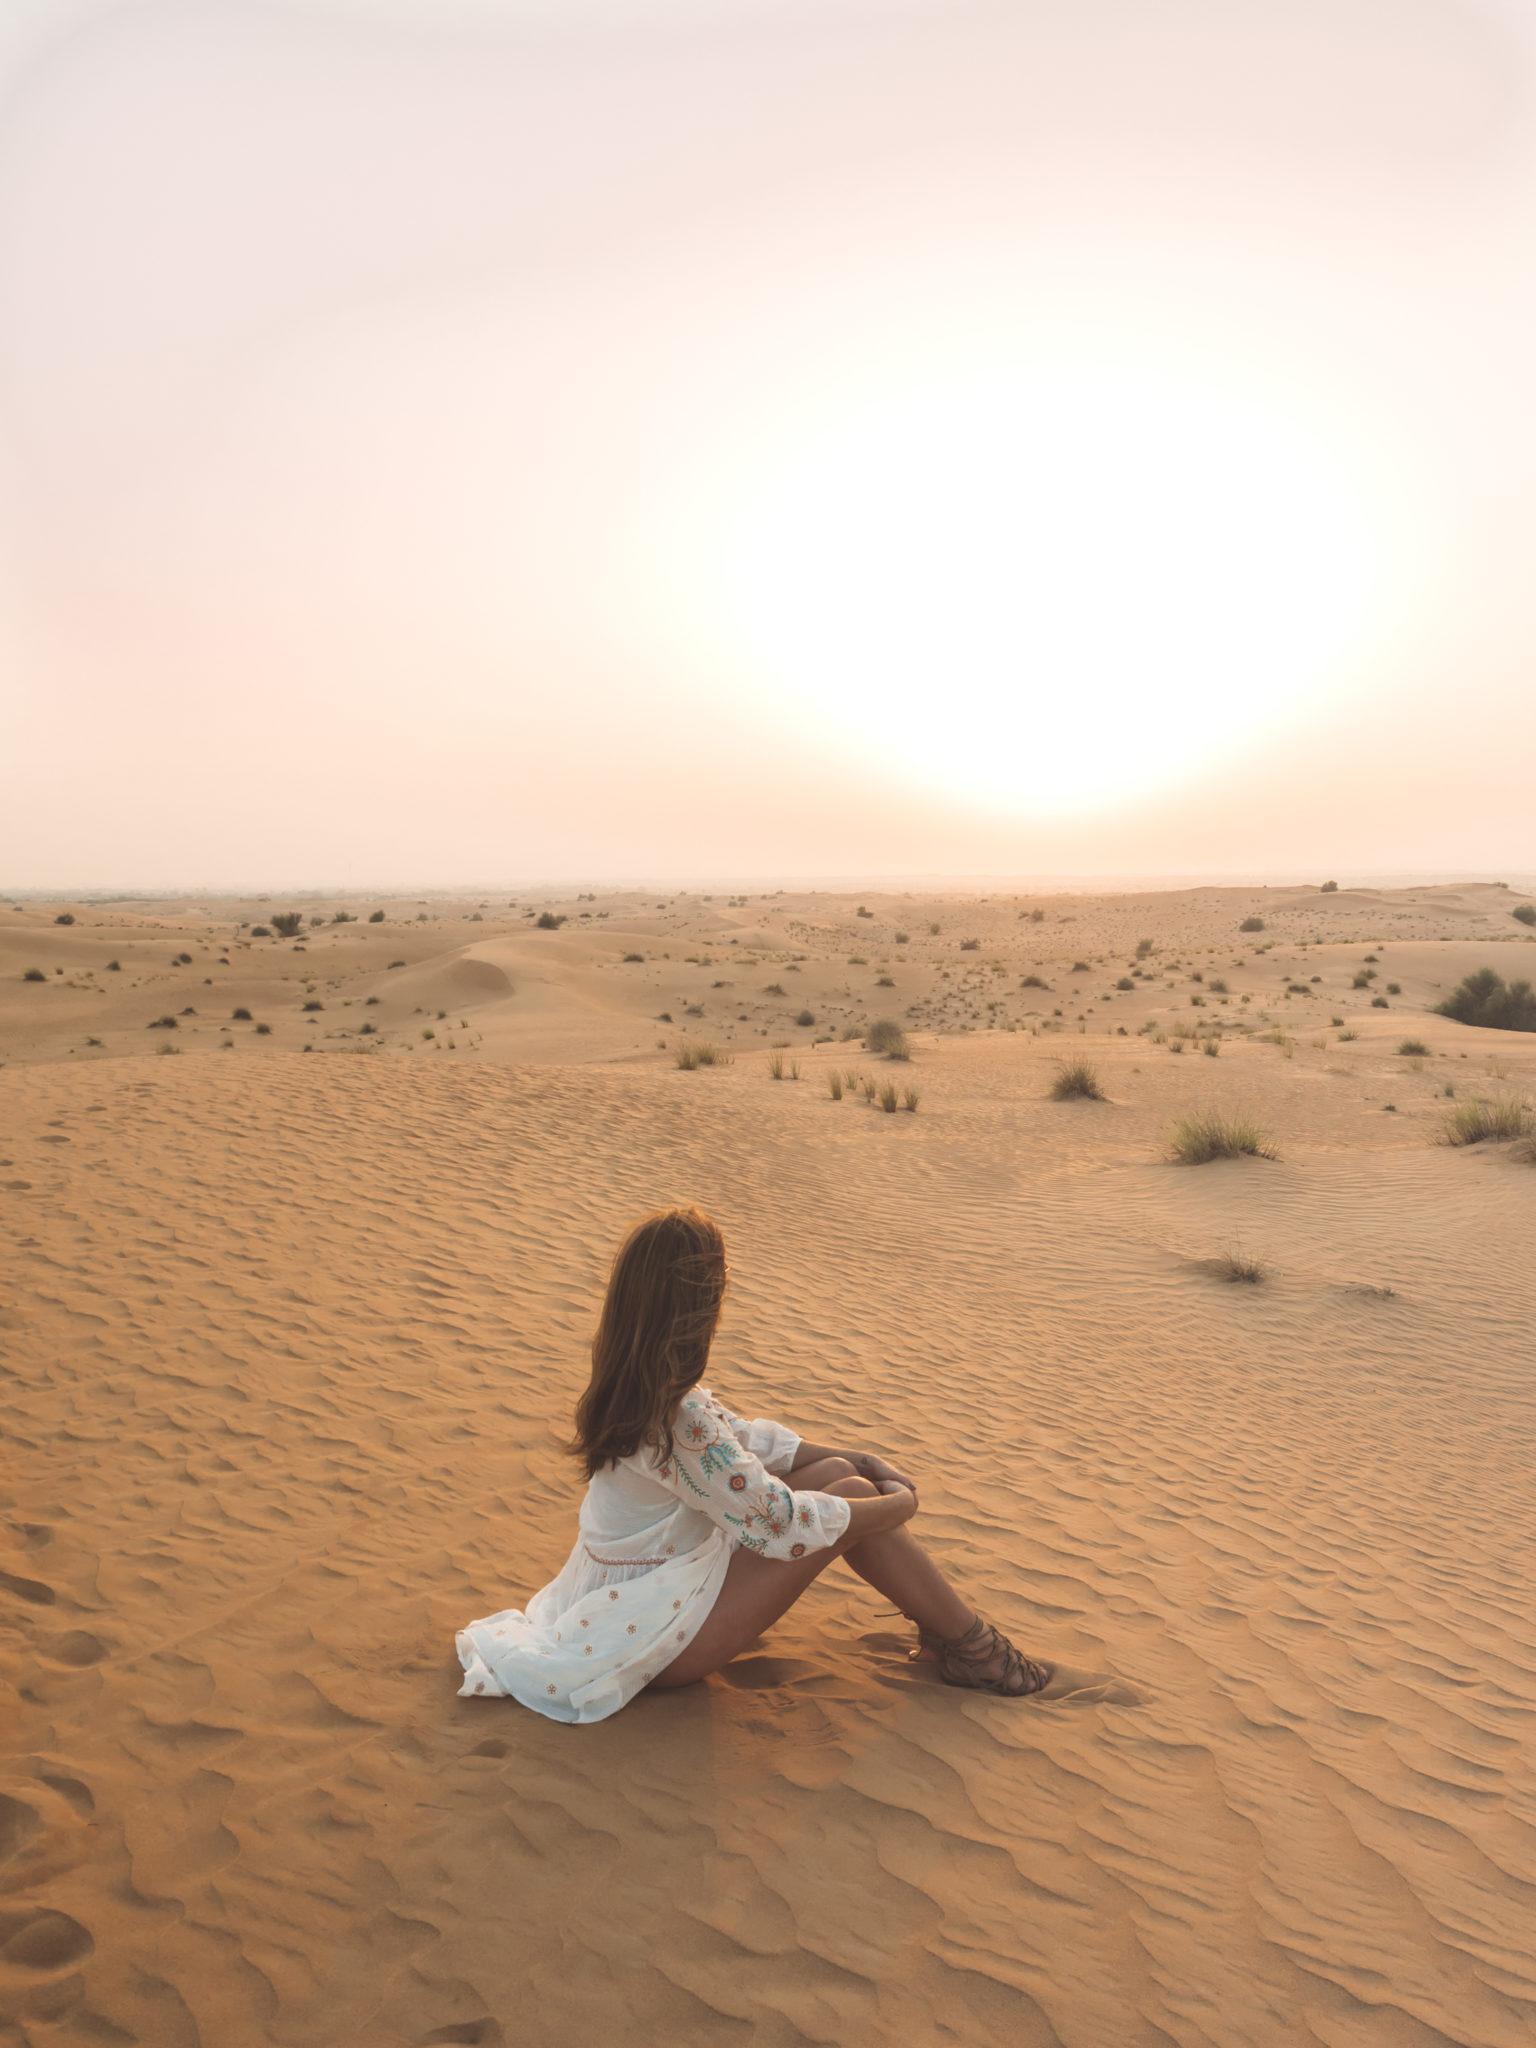 Desert Safari in Dubai | WORLD OF WANDERLUST